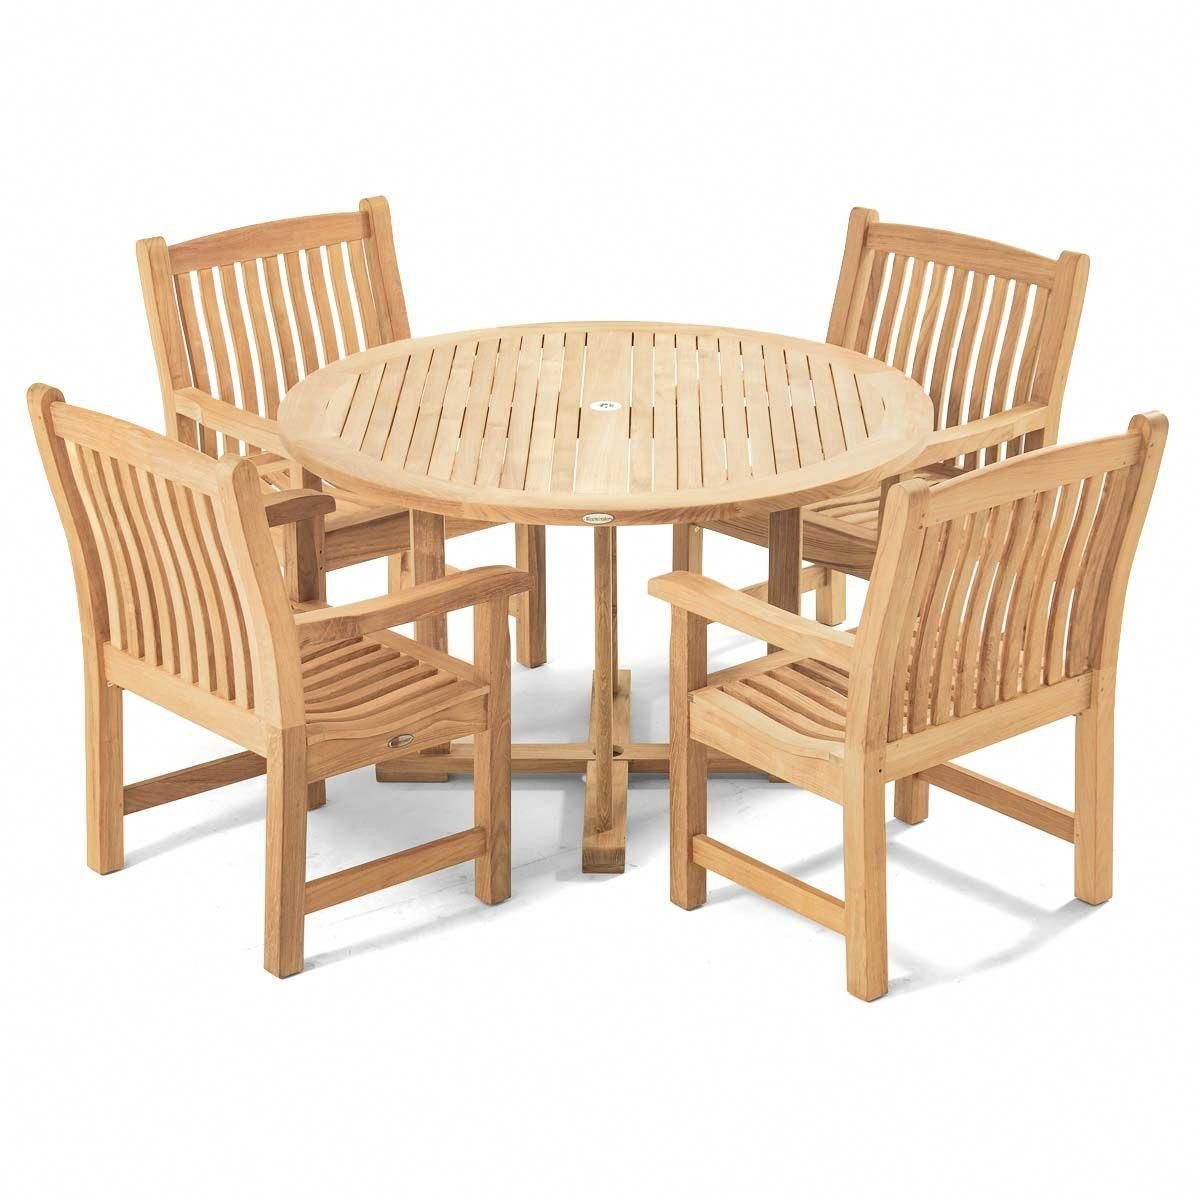 Veranda 4 Ft Round Teak Dining Set Discount Furniture Teak